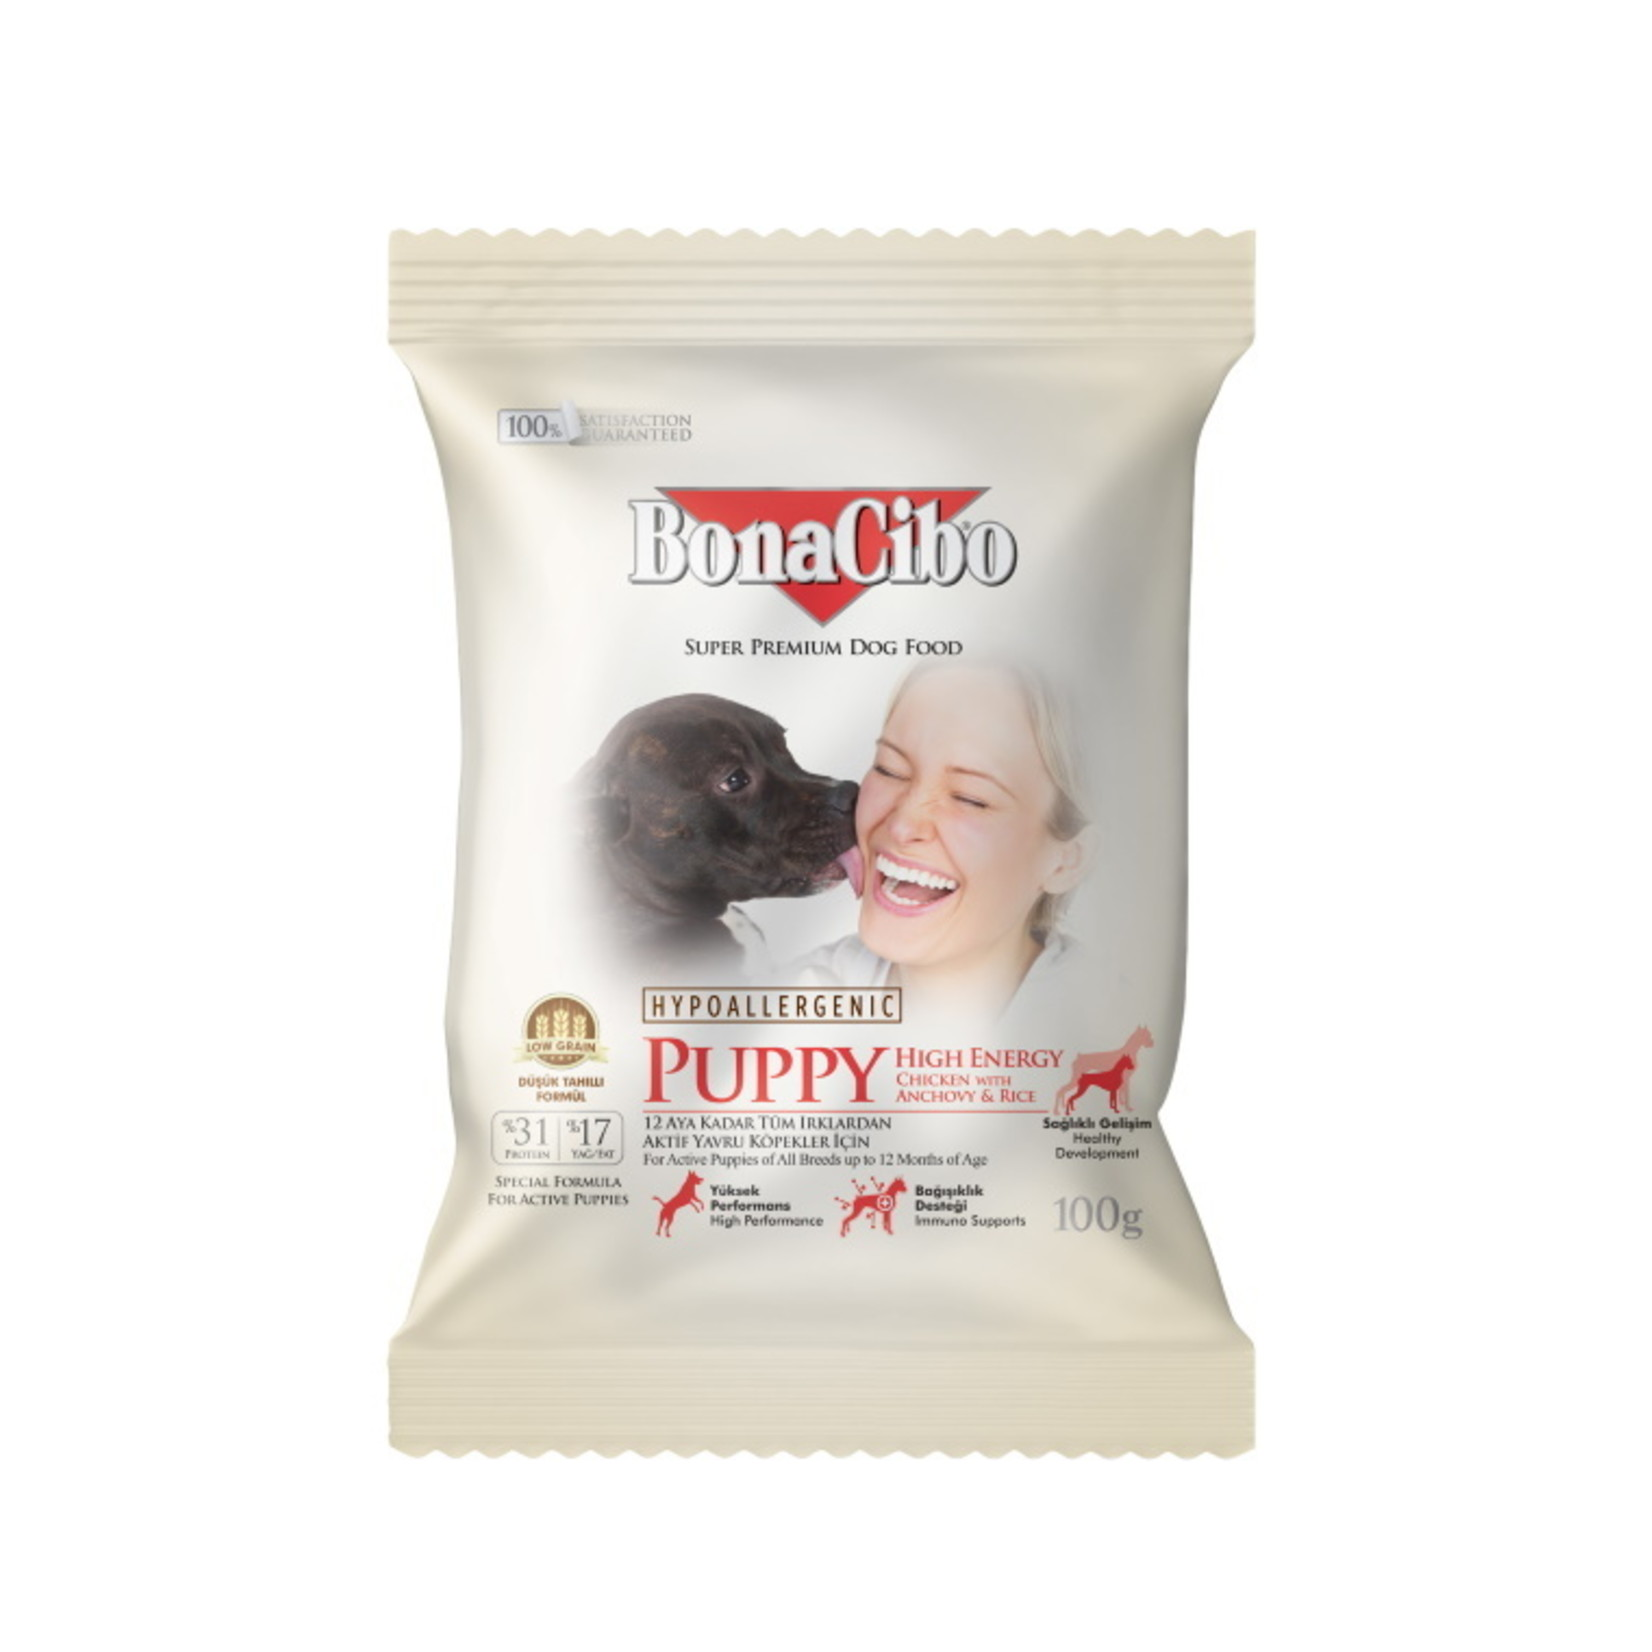 Bonacibo Sample 100 GR  Bonacibo Puppy High Energy